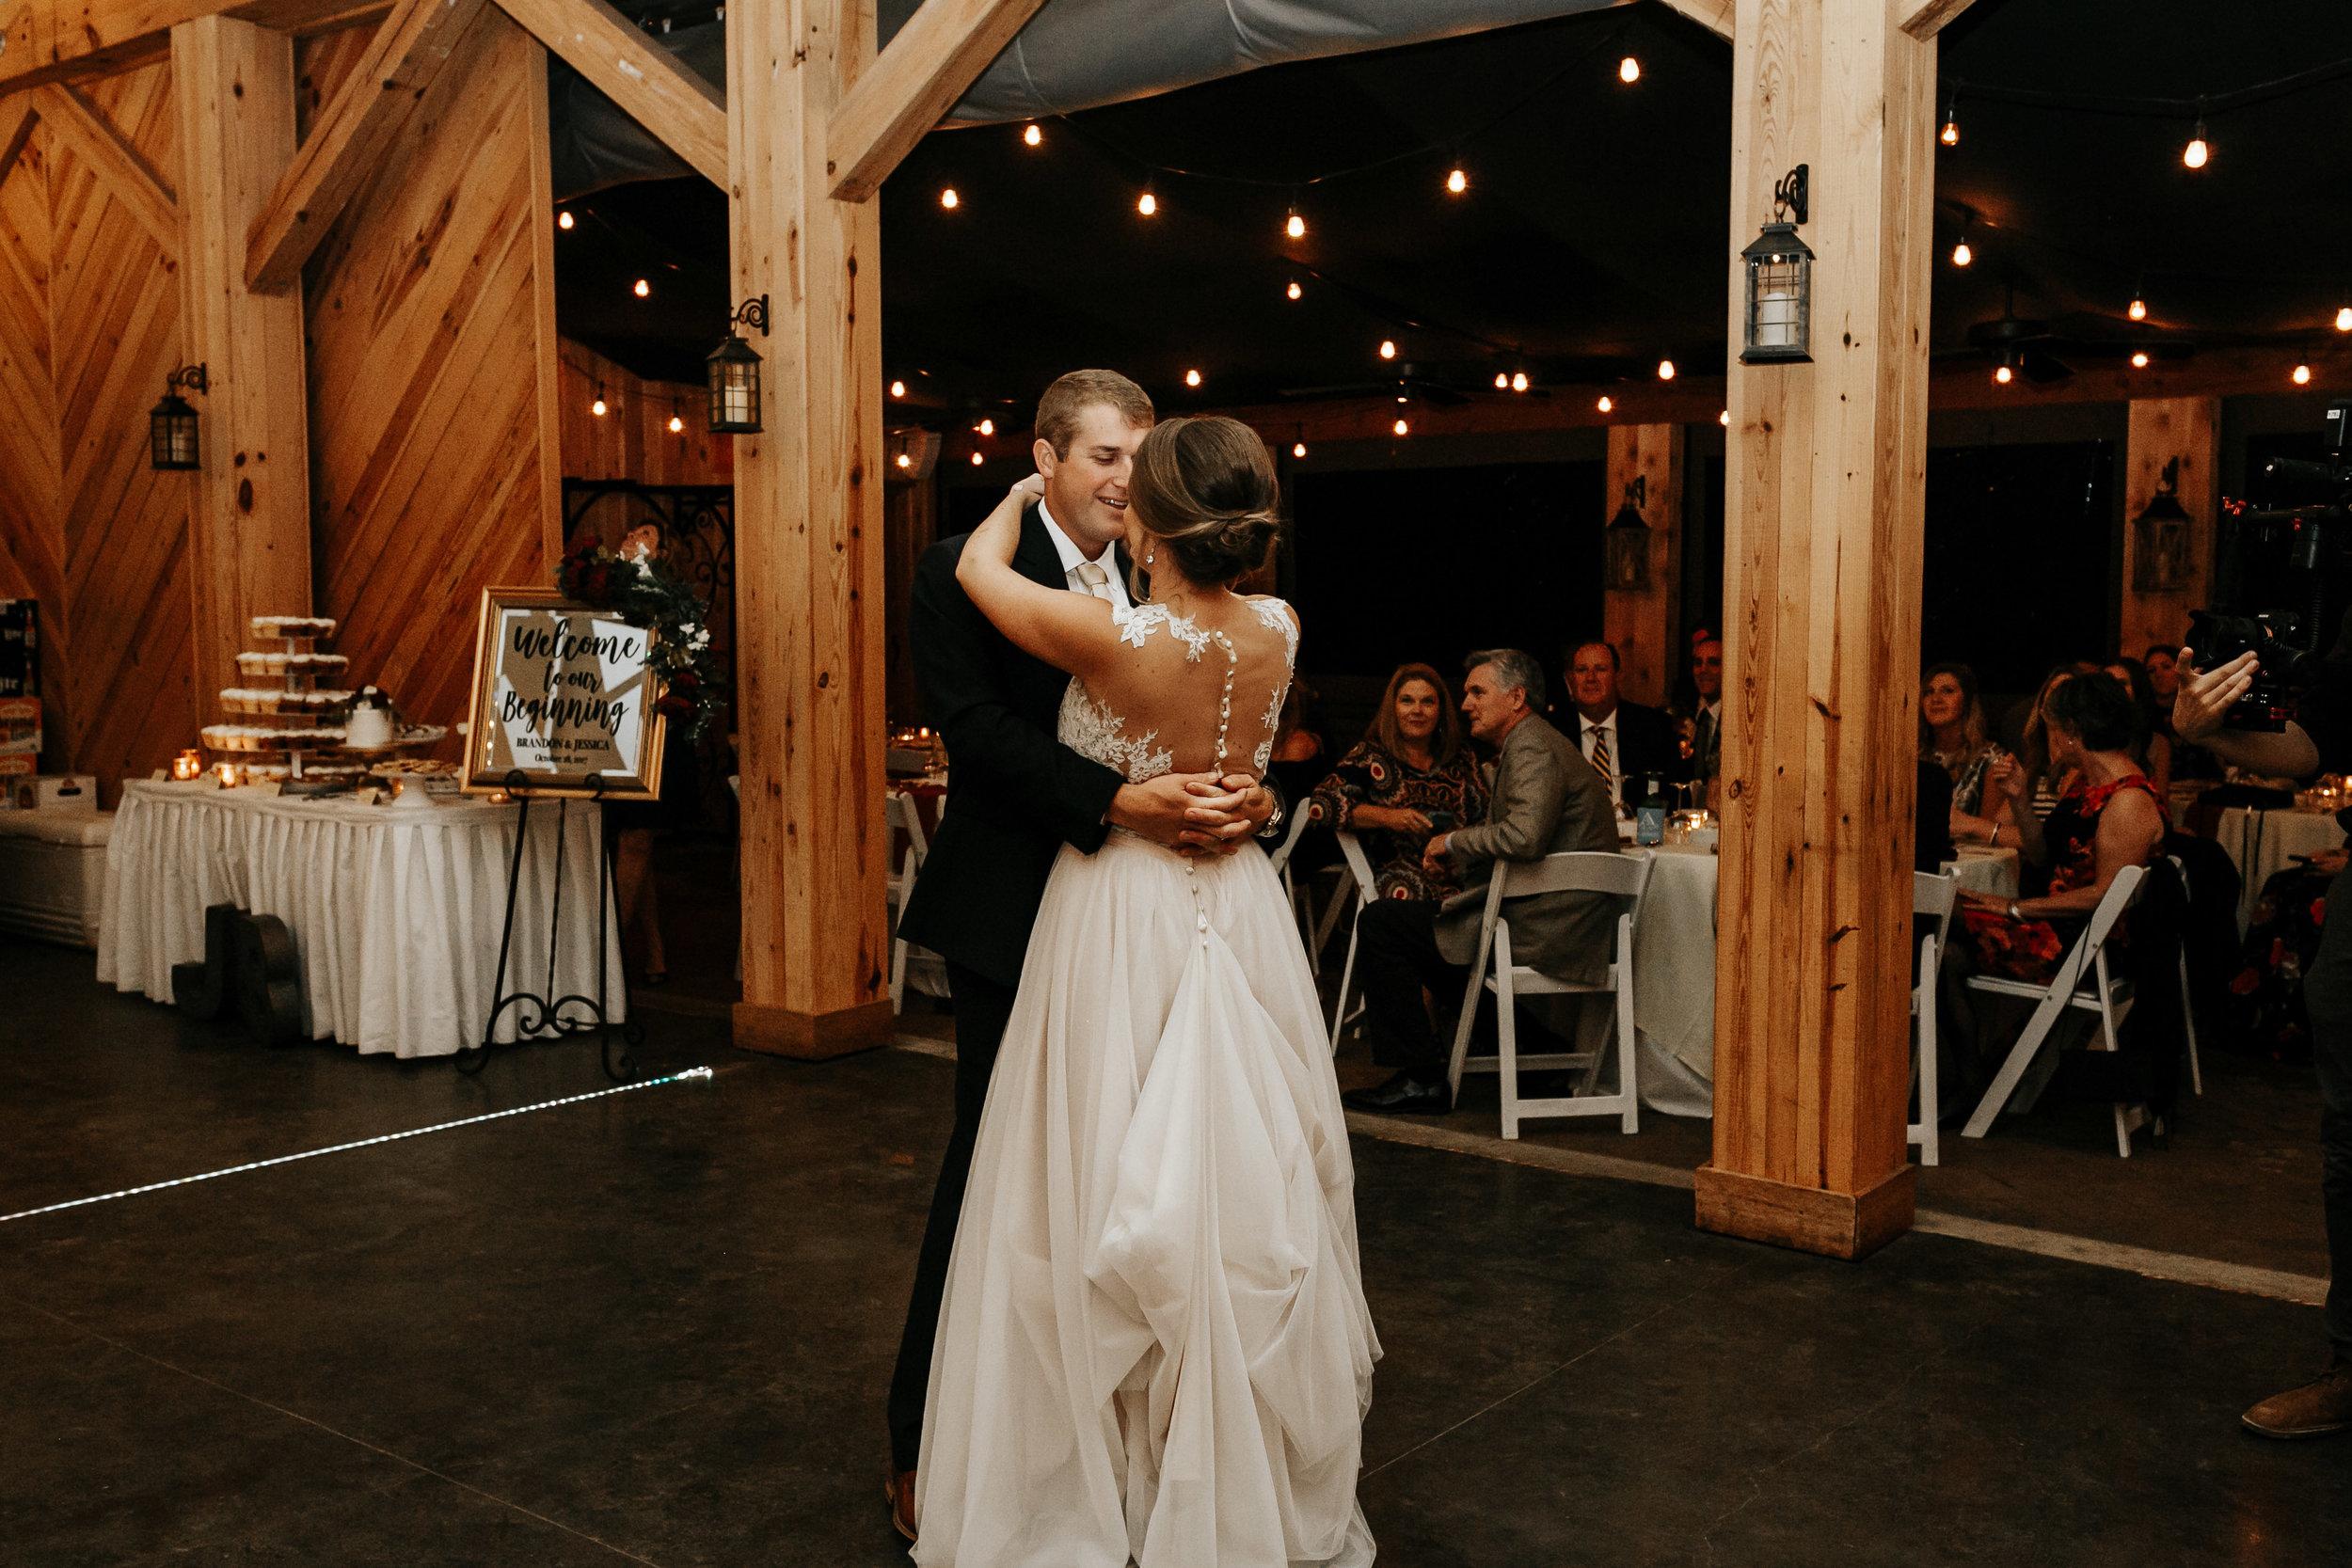 jessicabrandonwedding-62.jpg